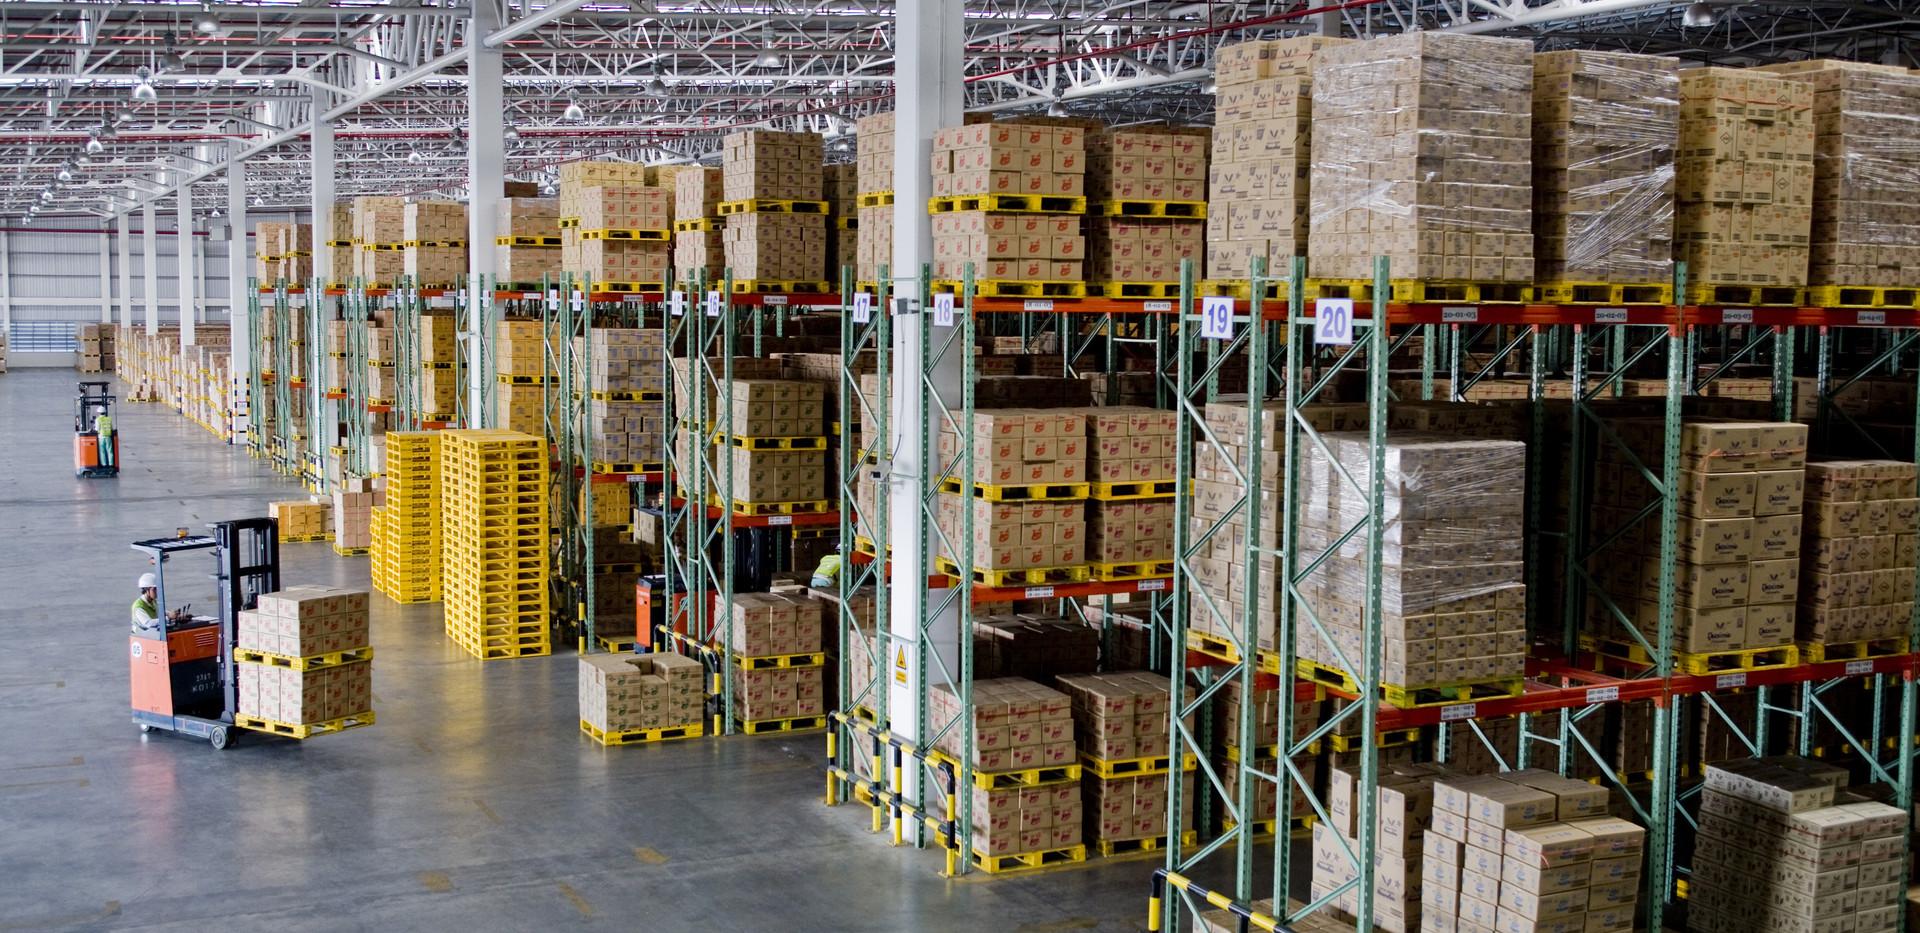 shutterstock_89041162.jpg